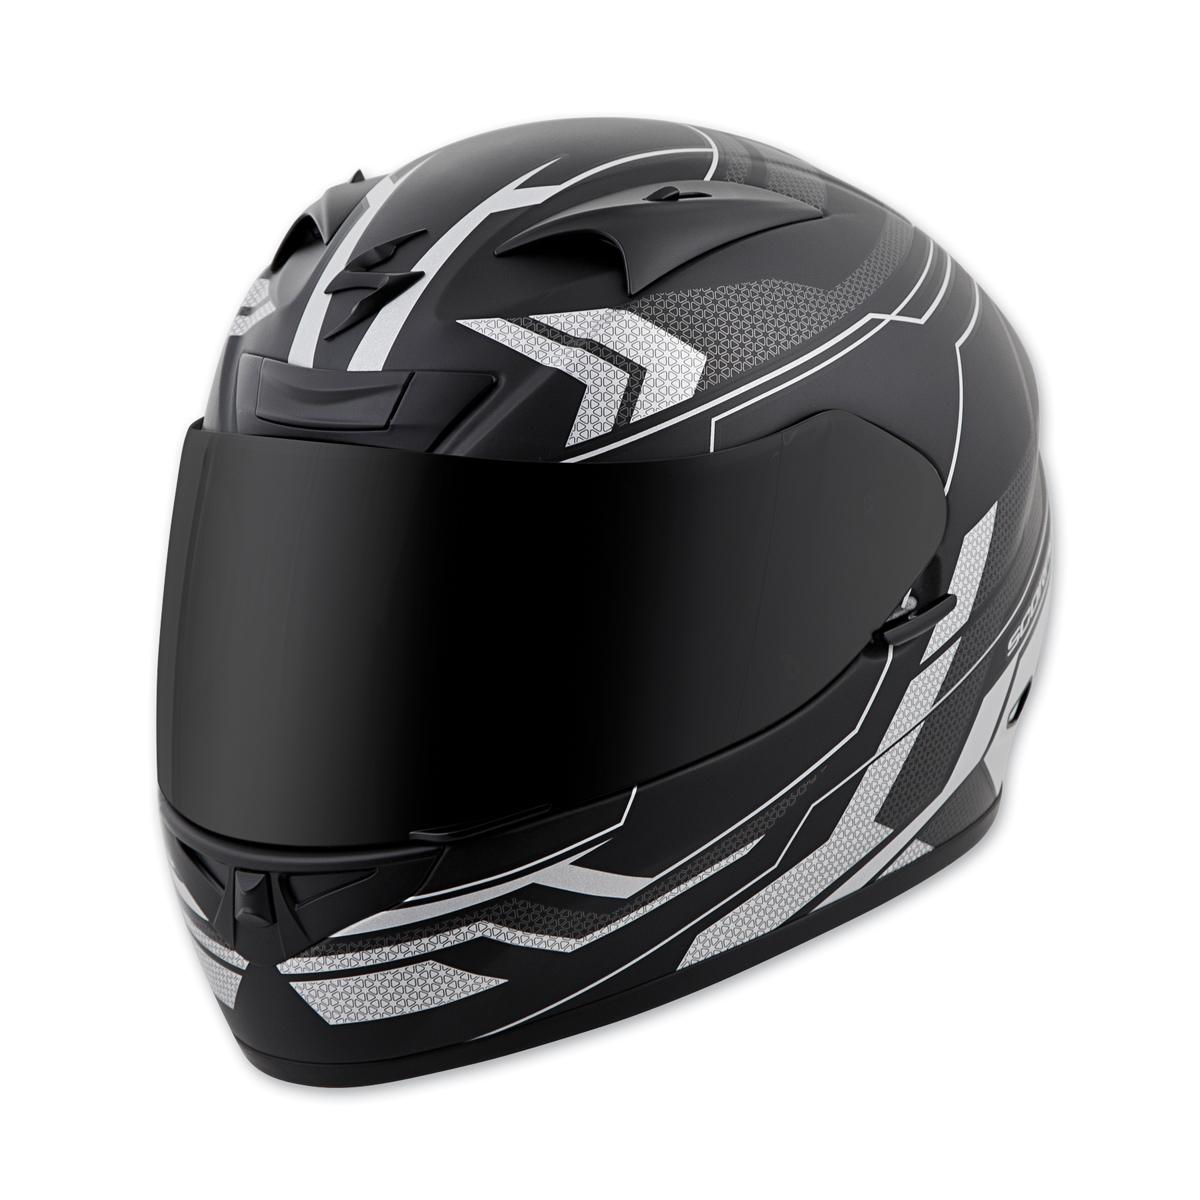 Scorpion EXO EXO-R710 Transect Silver Full Face Helmet